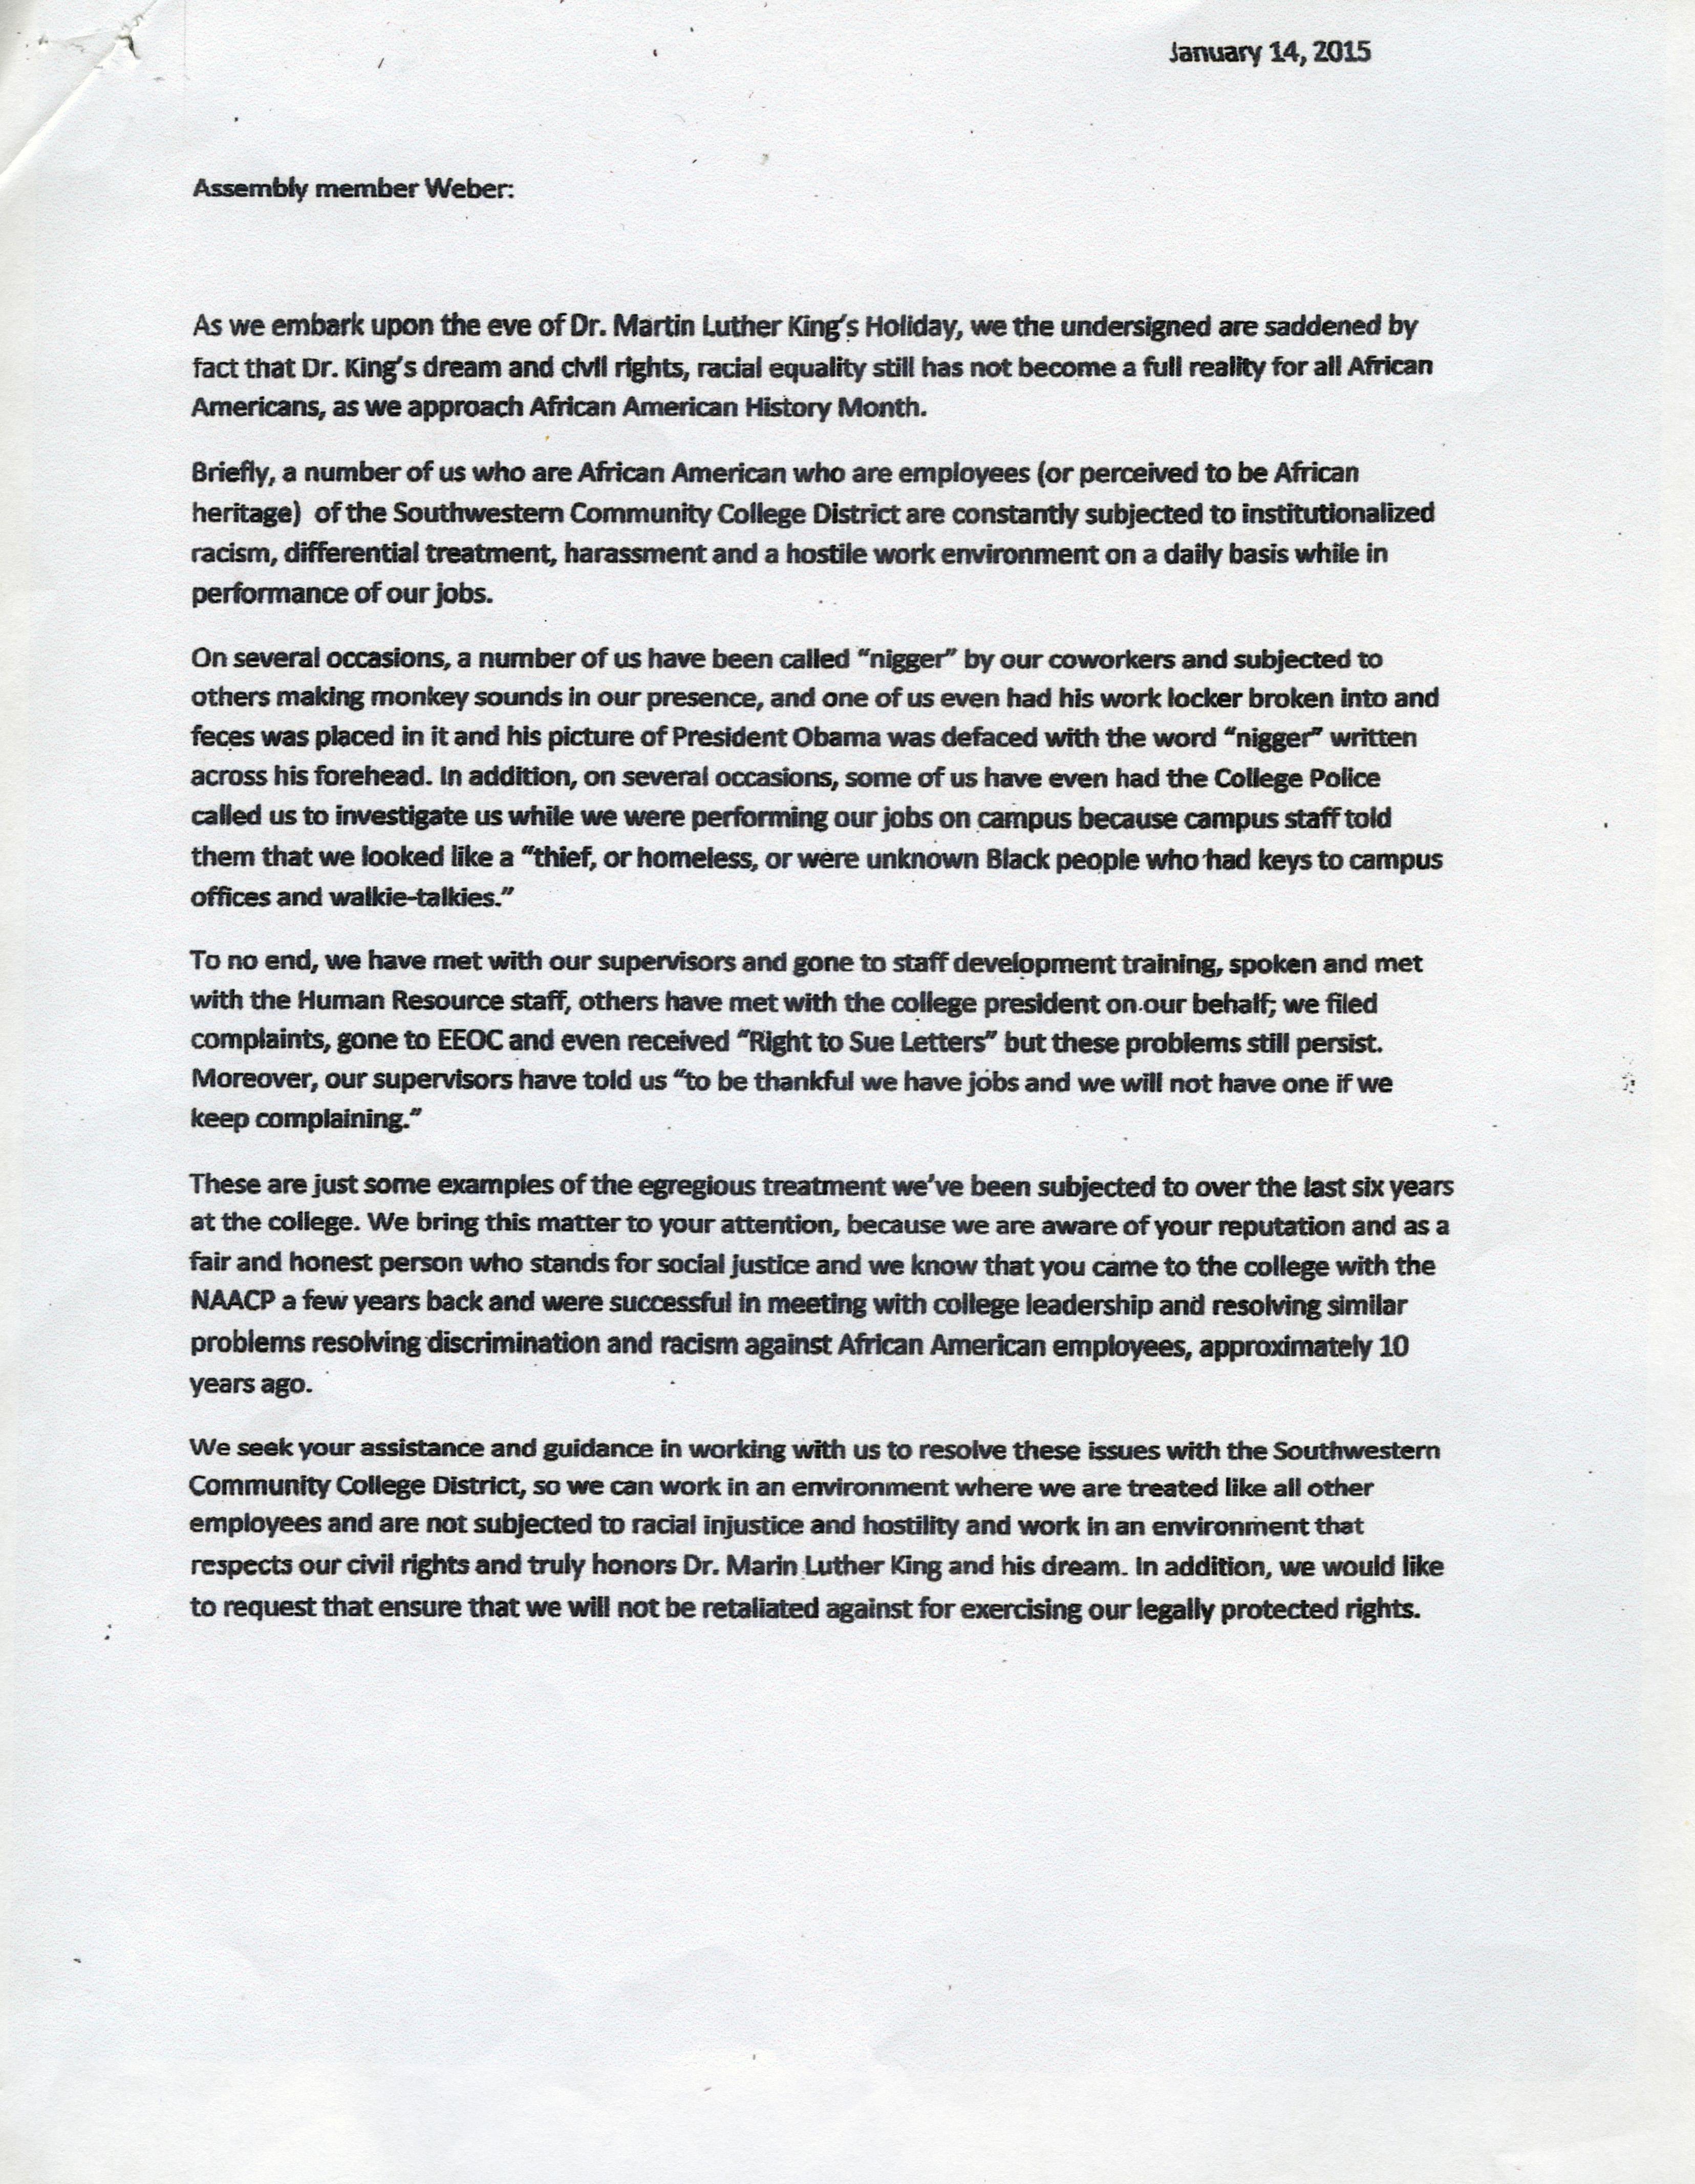 Unfair treatment at work sample letter - Sample Complaint Letter Unfair Treatment At Work